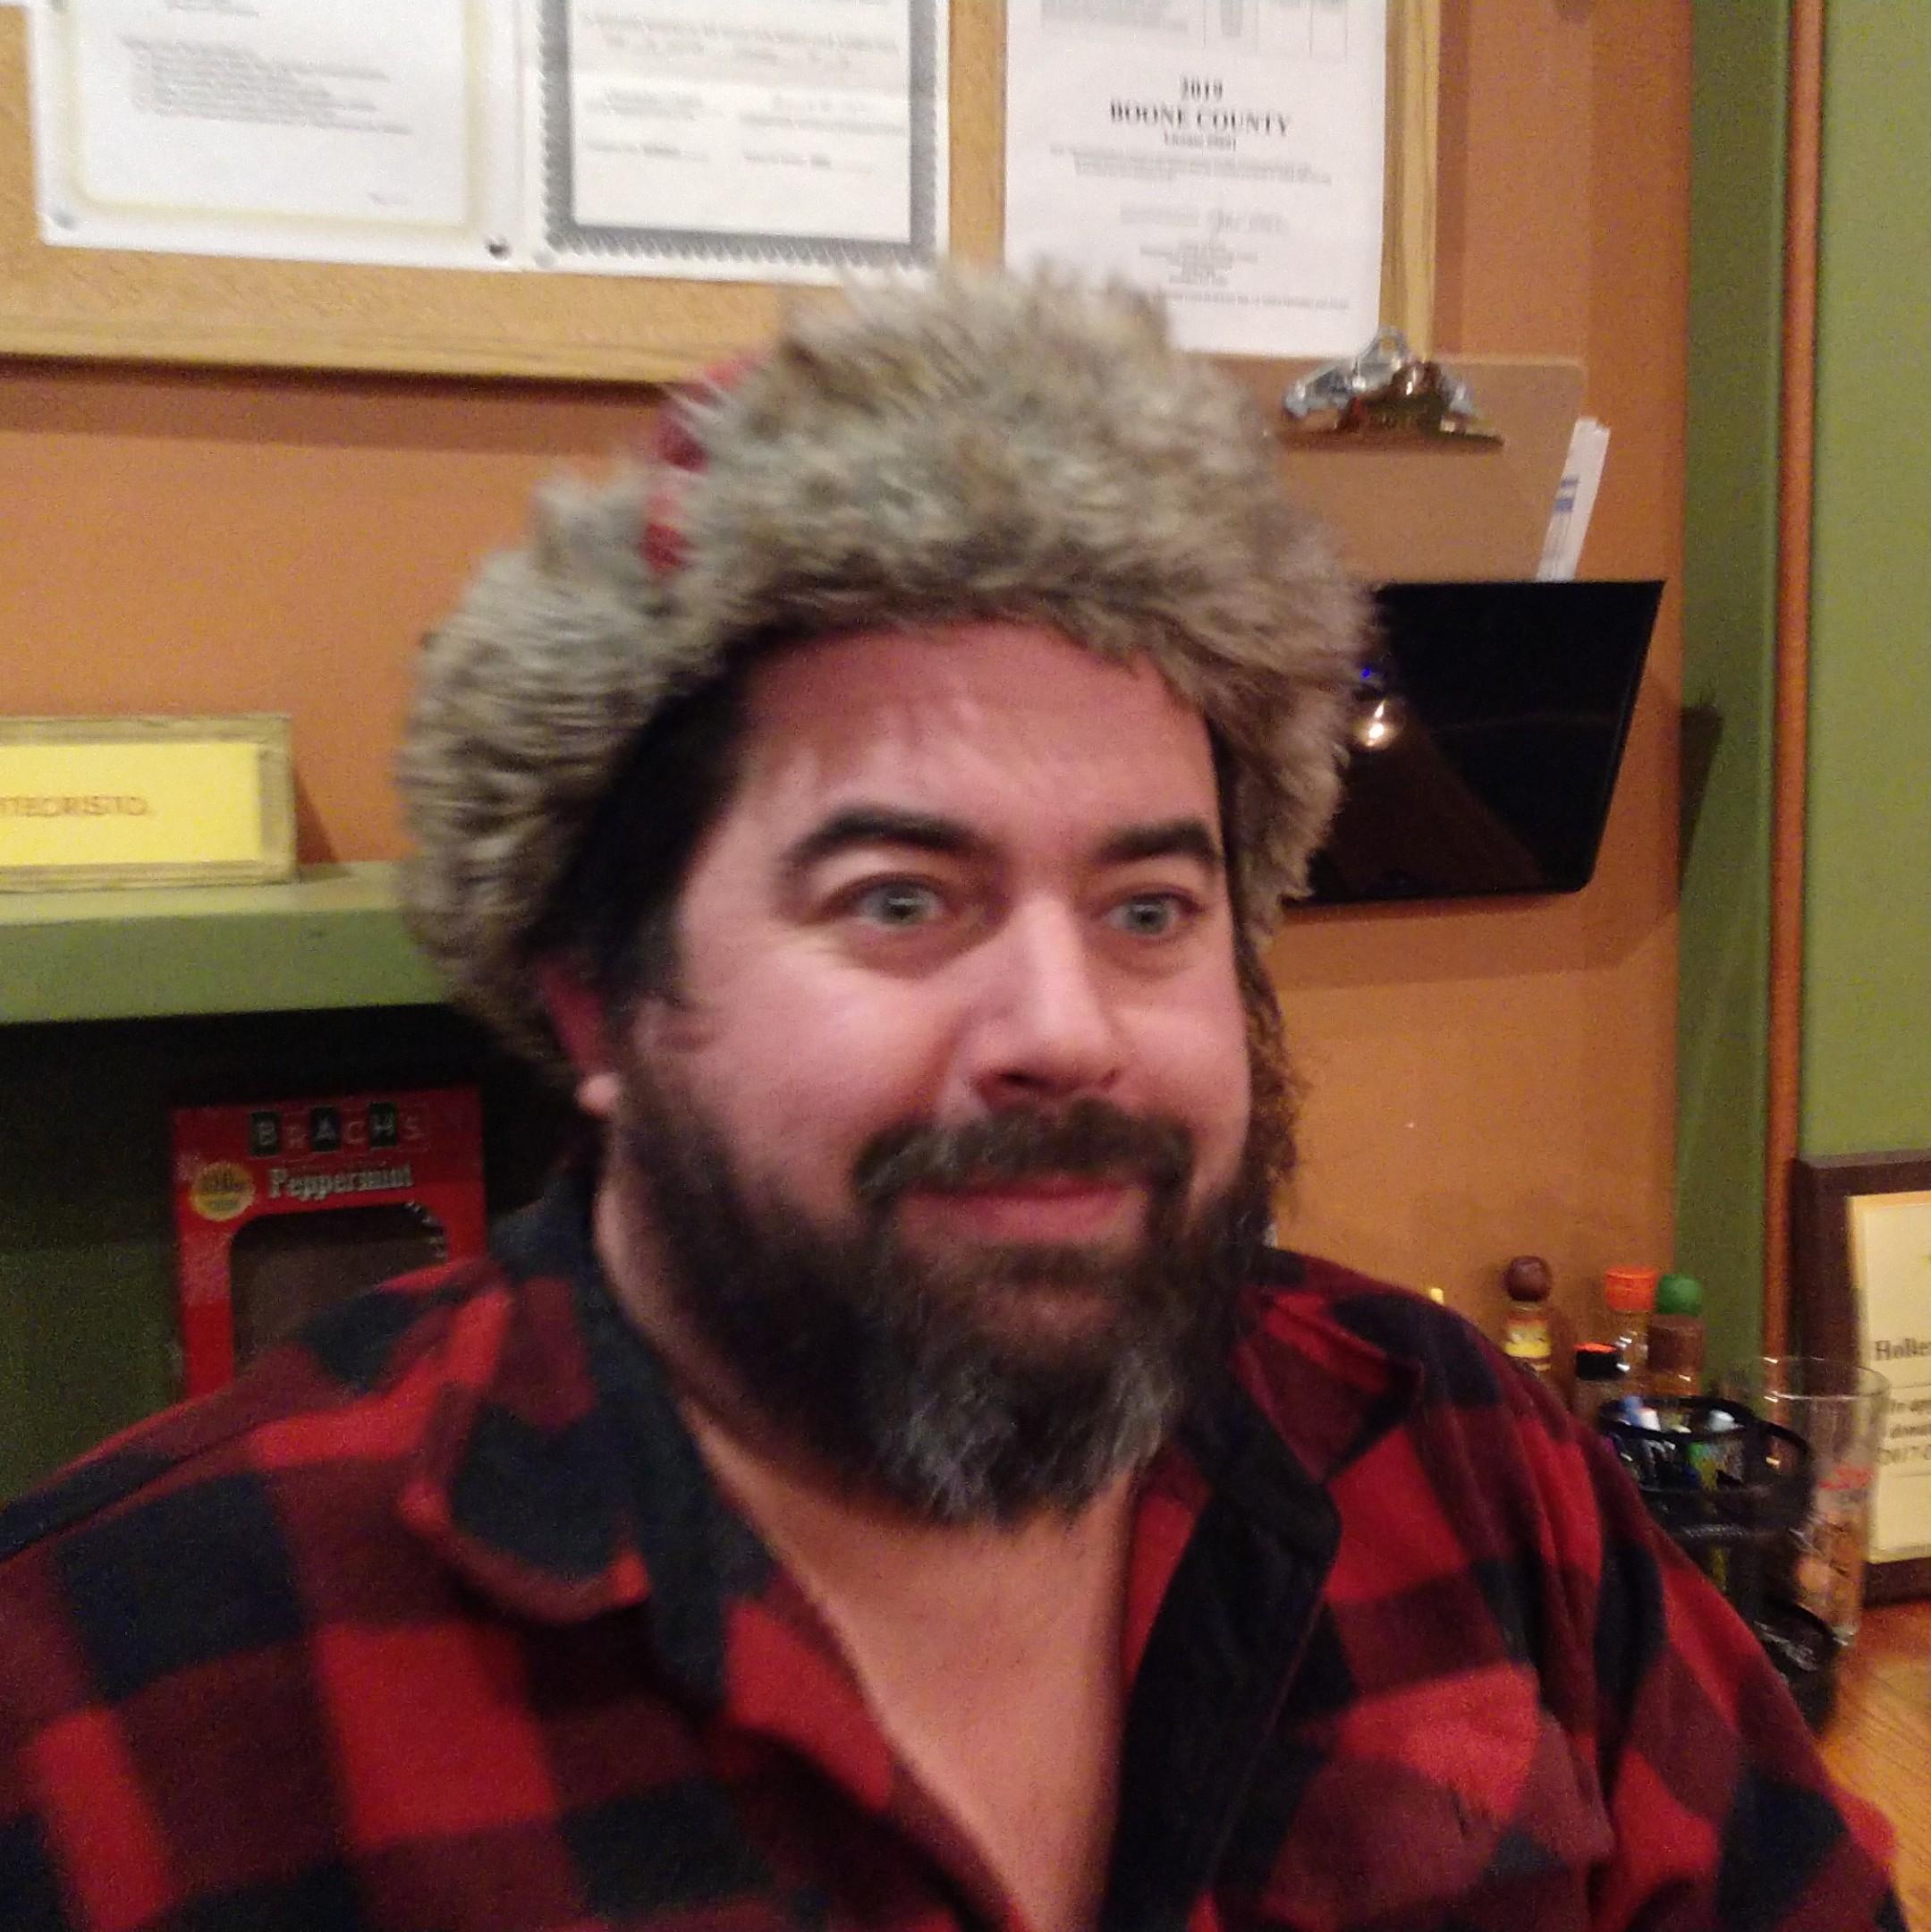 Trent - Owner, Man of Strange Hats and Crazy Eyes